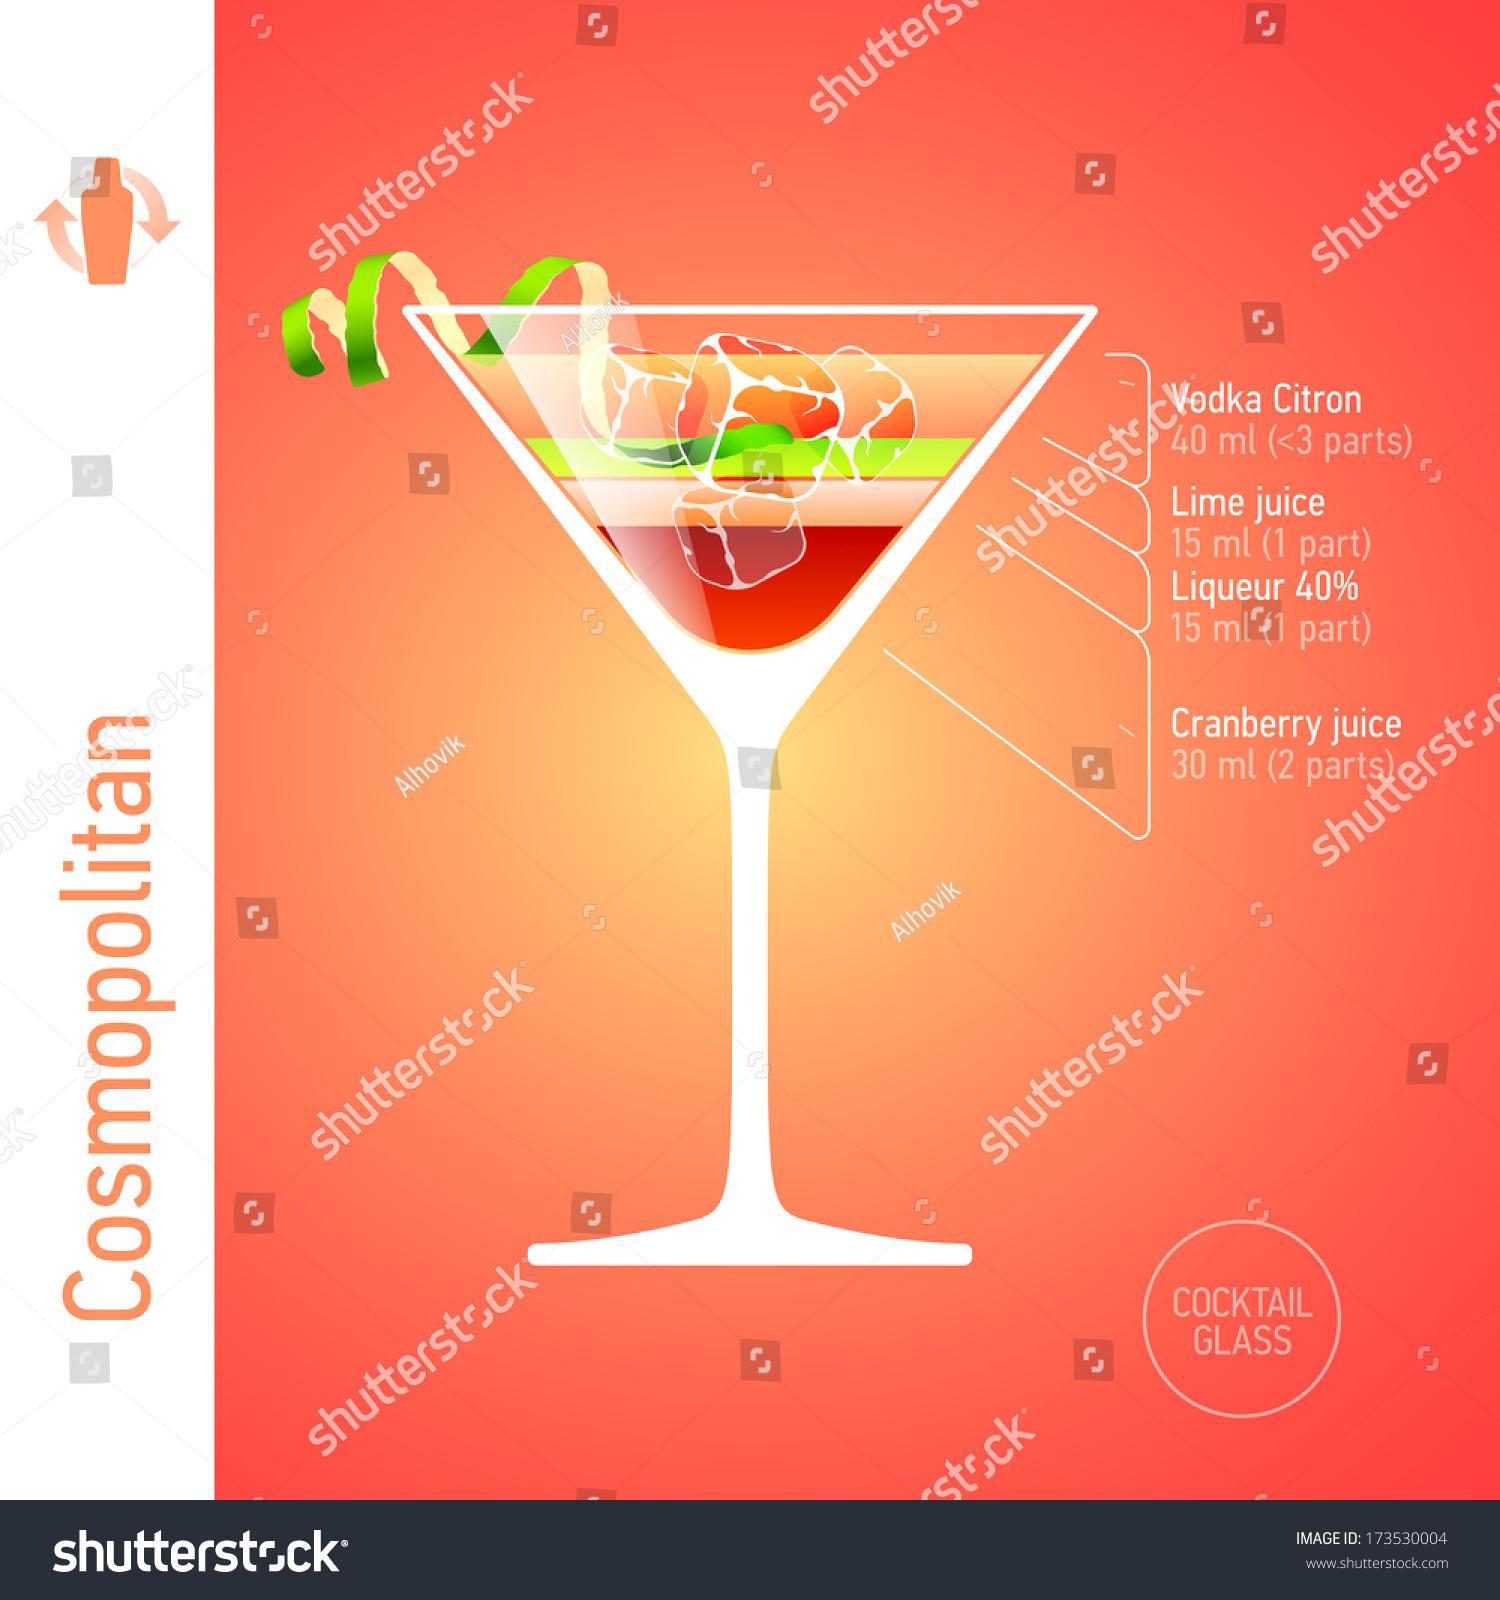 Cosmopolitan cocktail ingredients vector stock vector for Cocktail recipe by ingredients